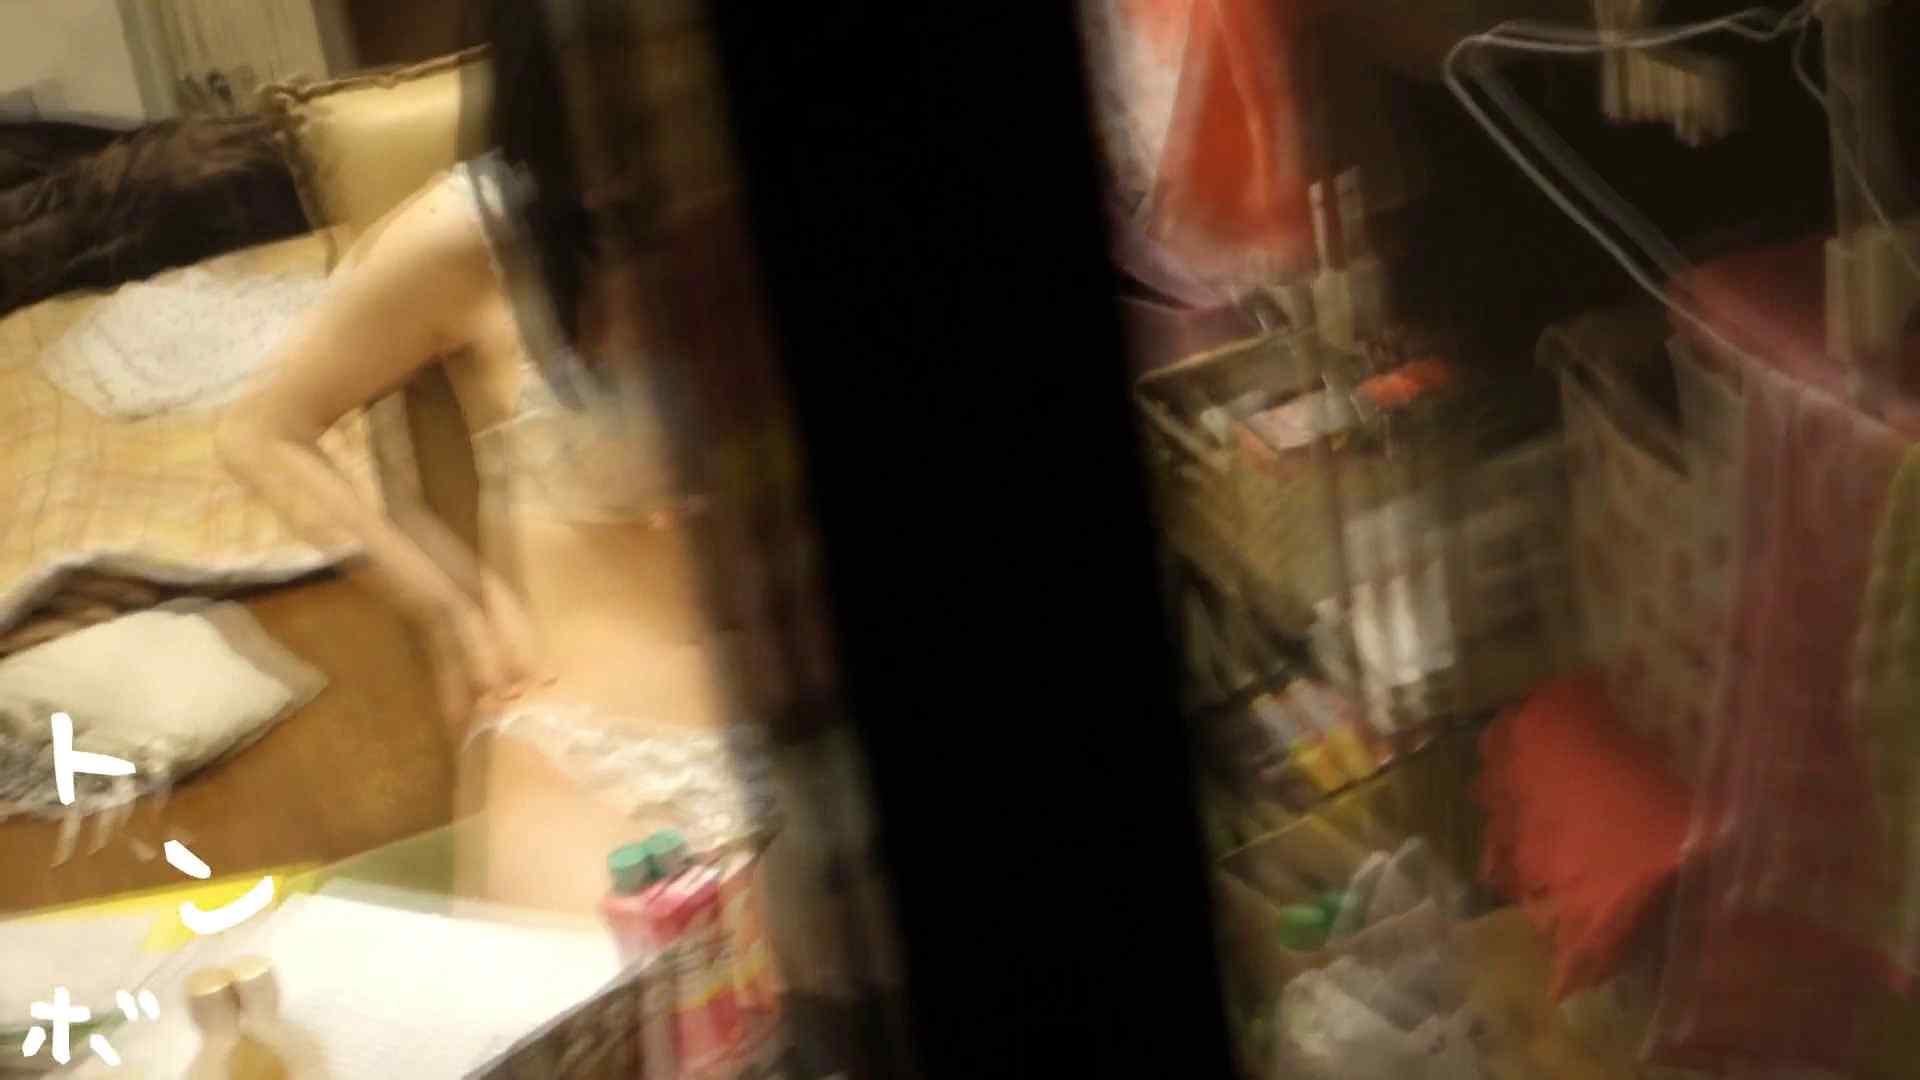 【15位 2016】リアル盗撮 S級美女女子大生の私生活1 美女 | 高画質  83画像 31